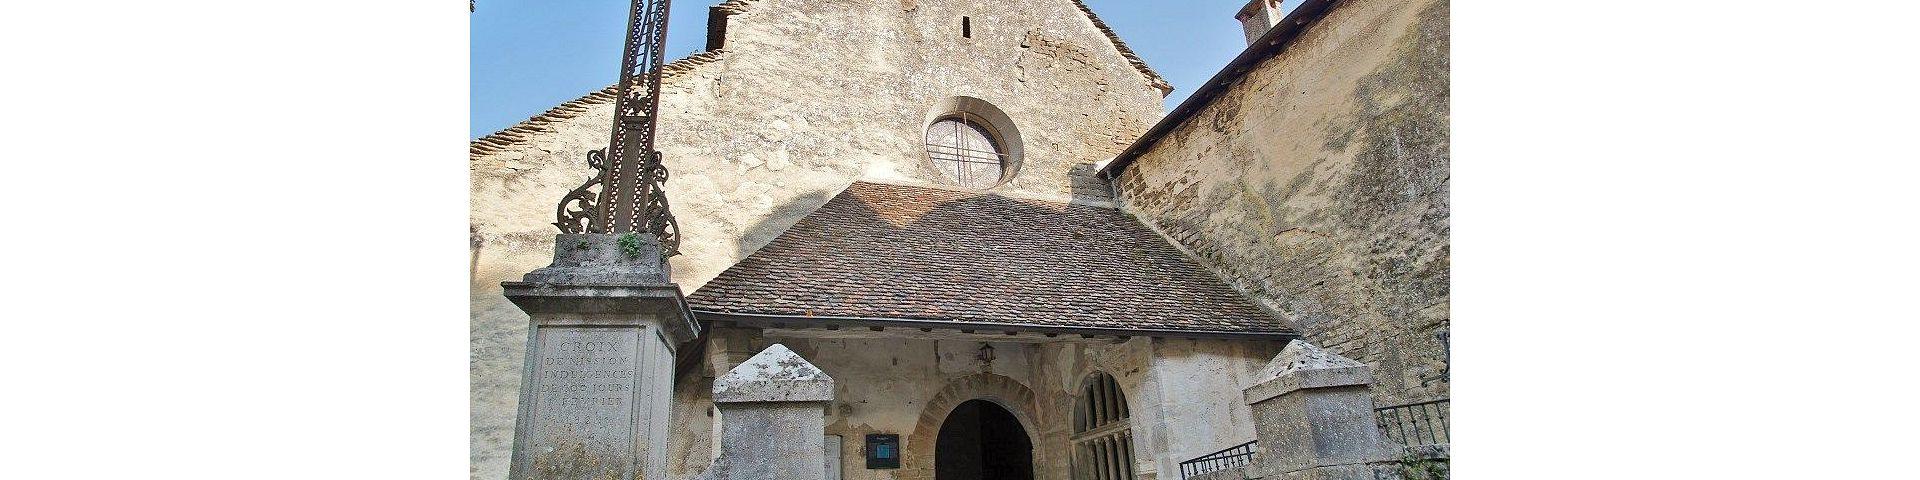 Chateau-Chalon - Eglise (39)